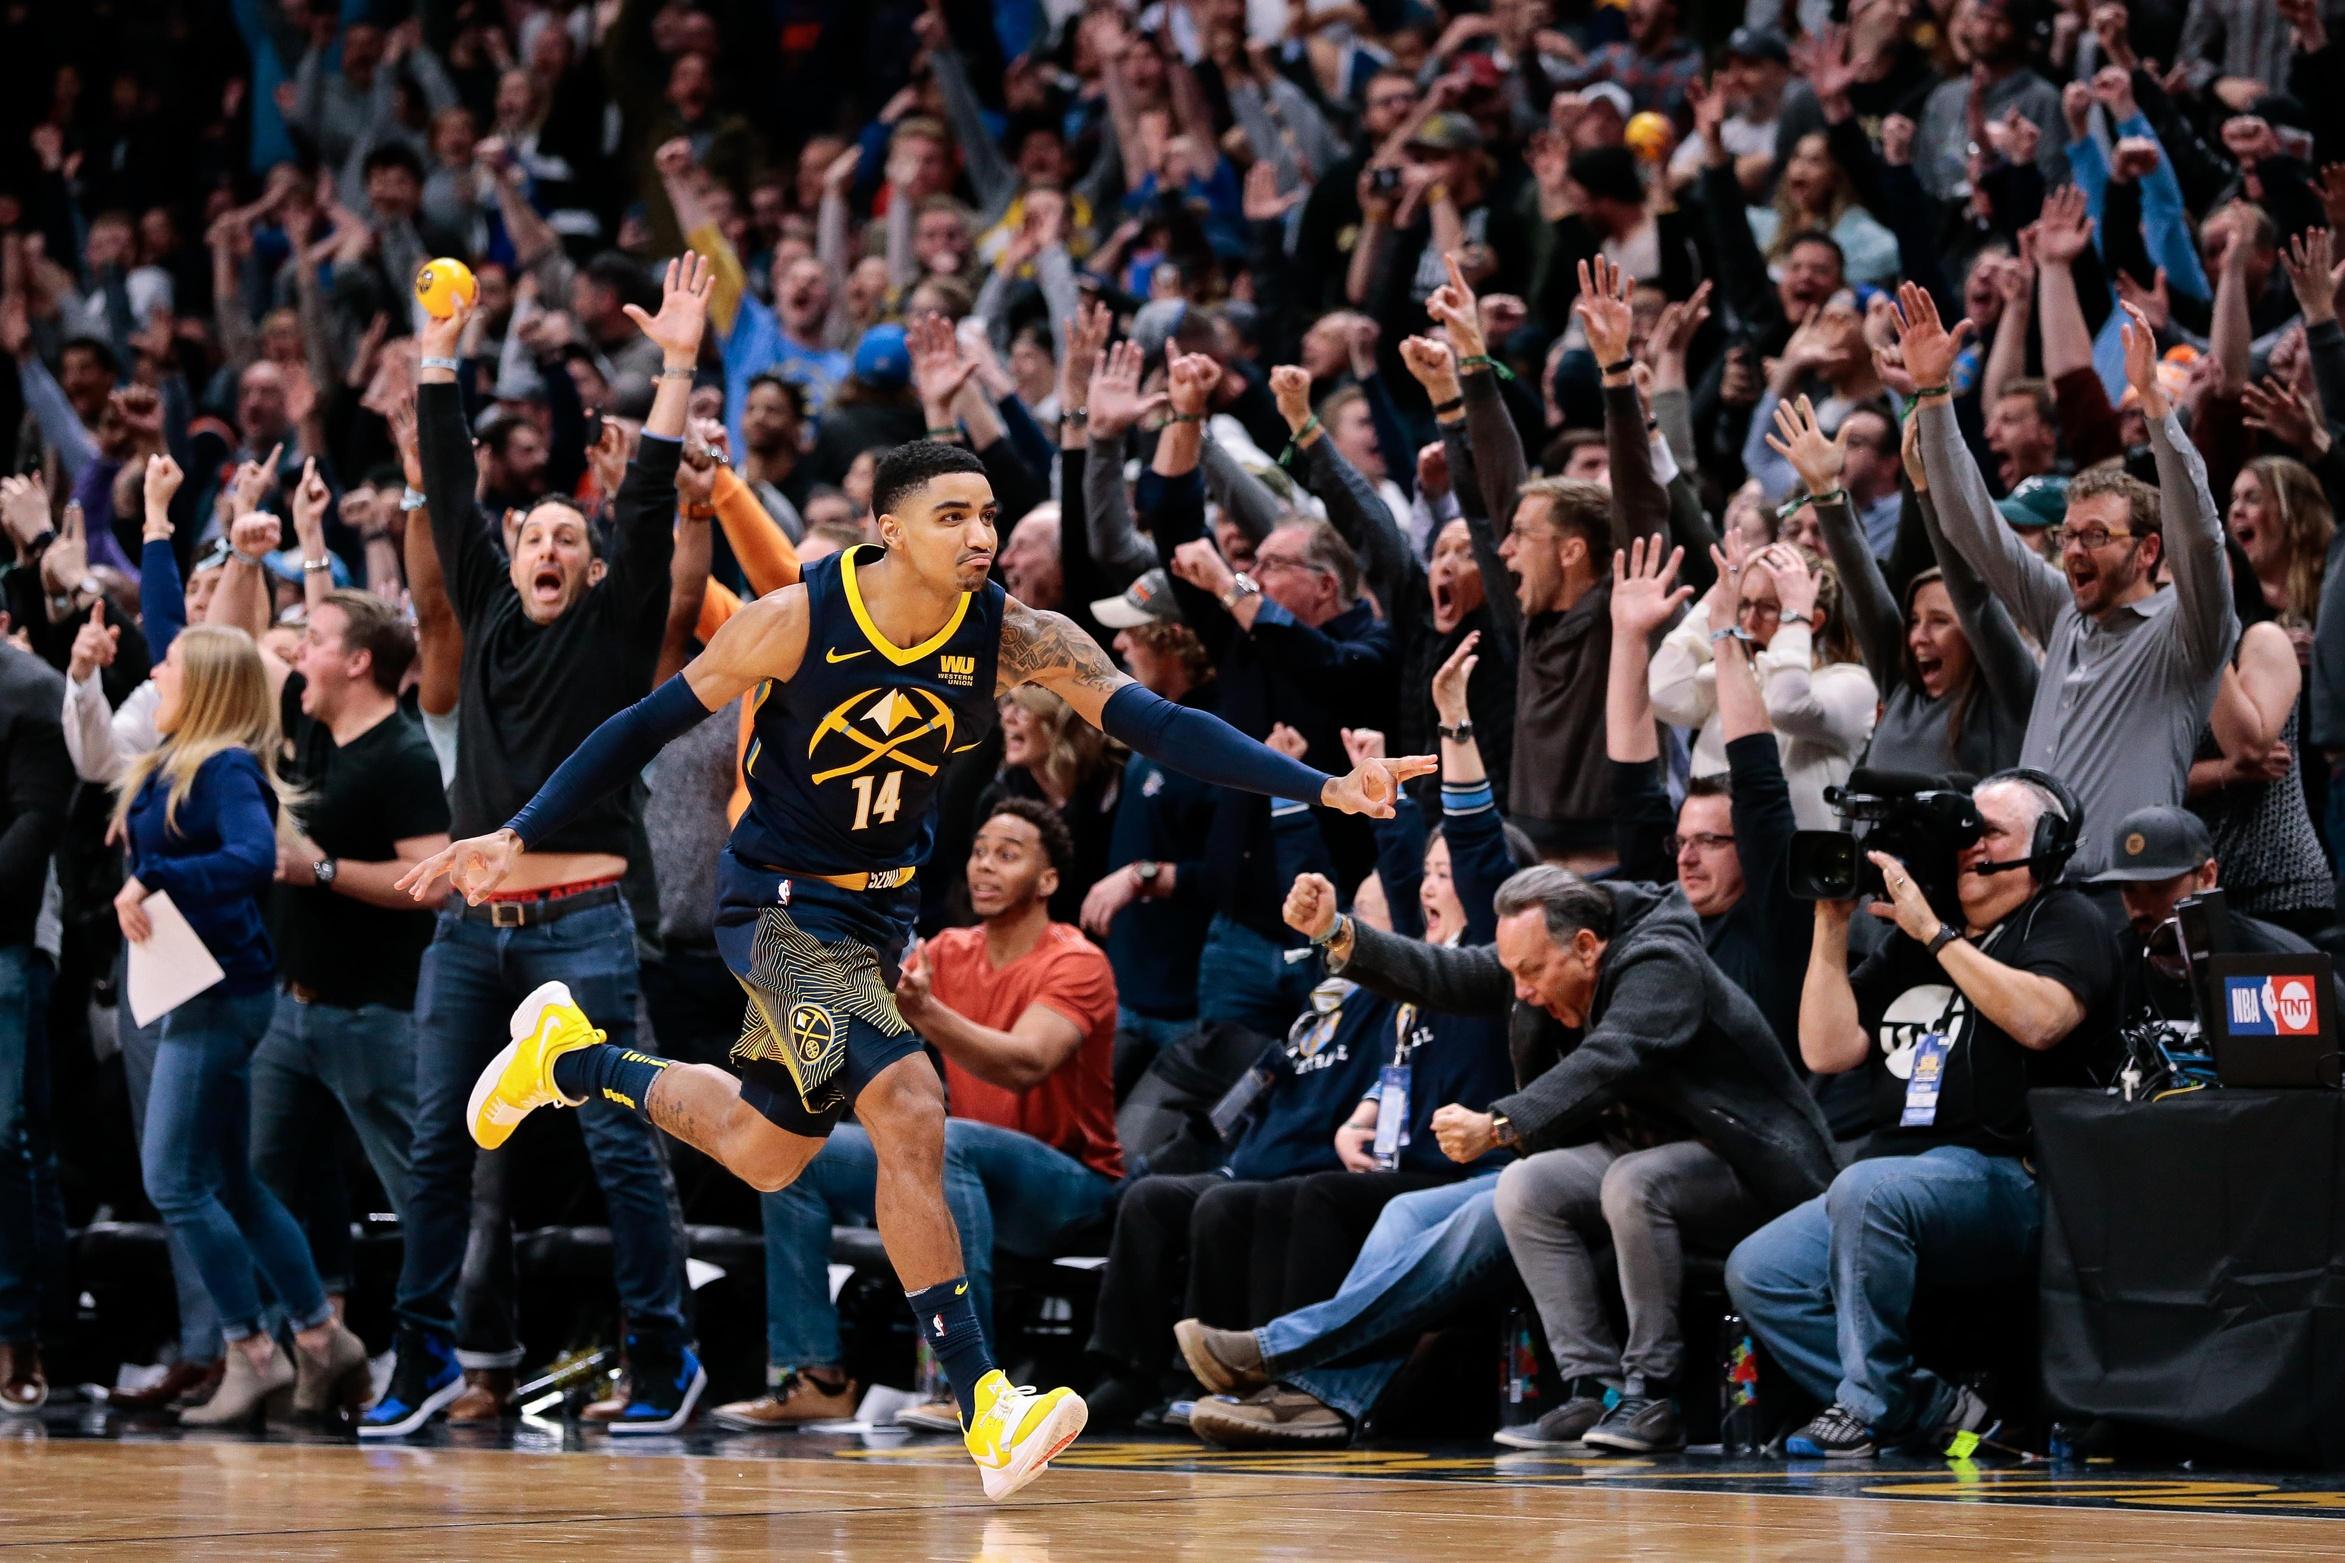 Thunder's Westbrook shoves fan on court docket after loss